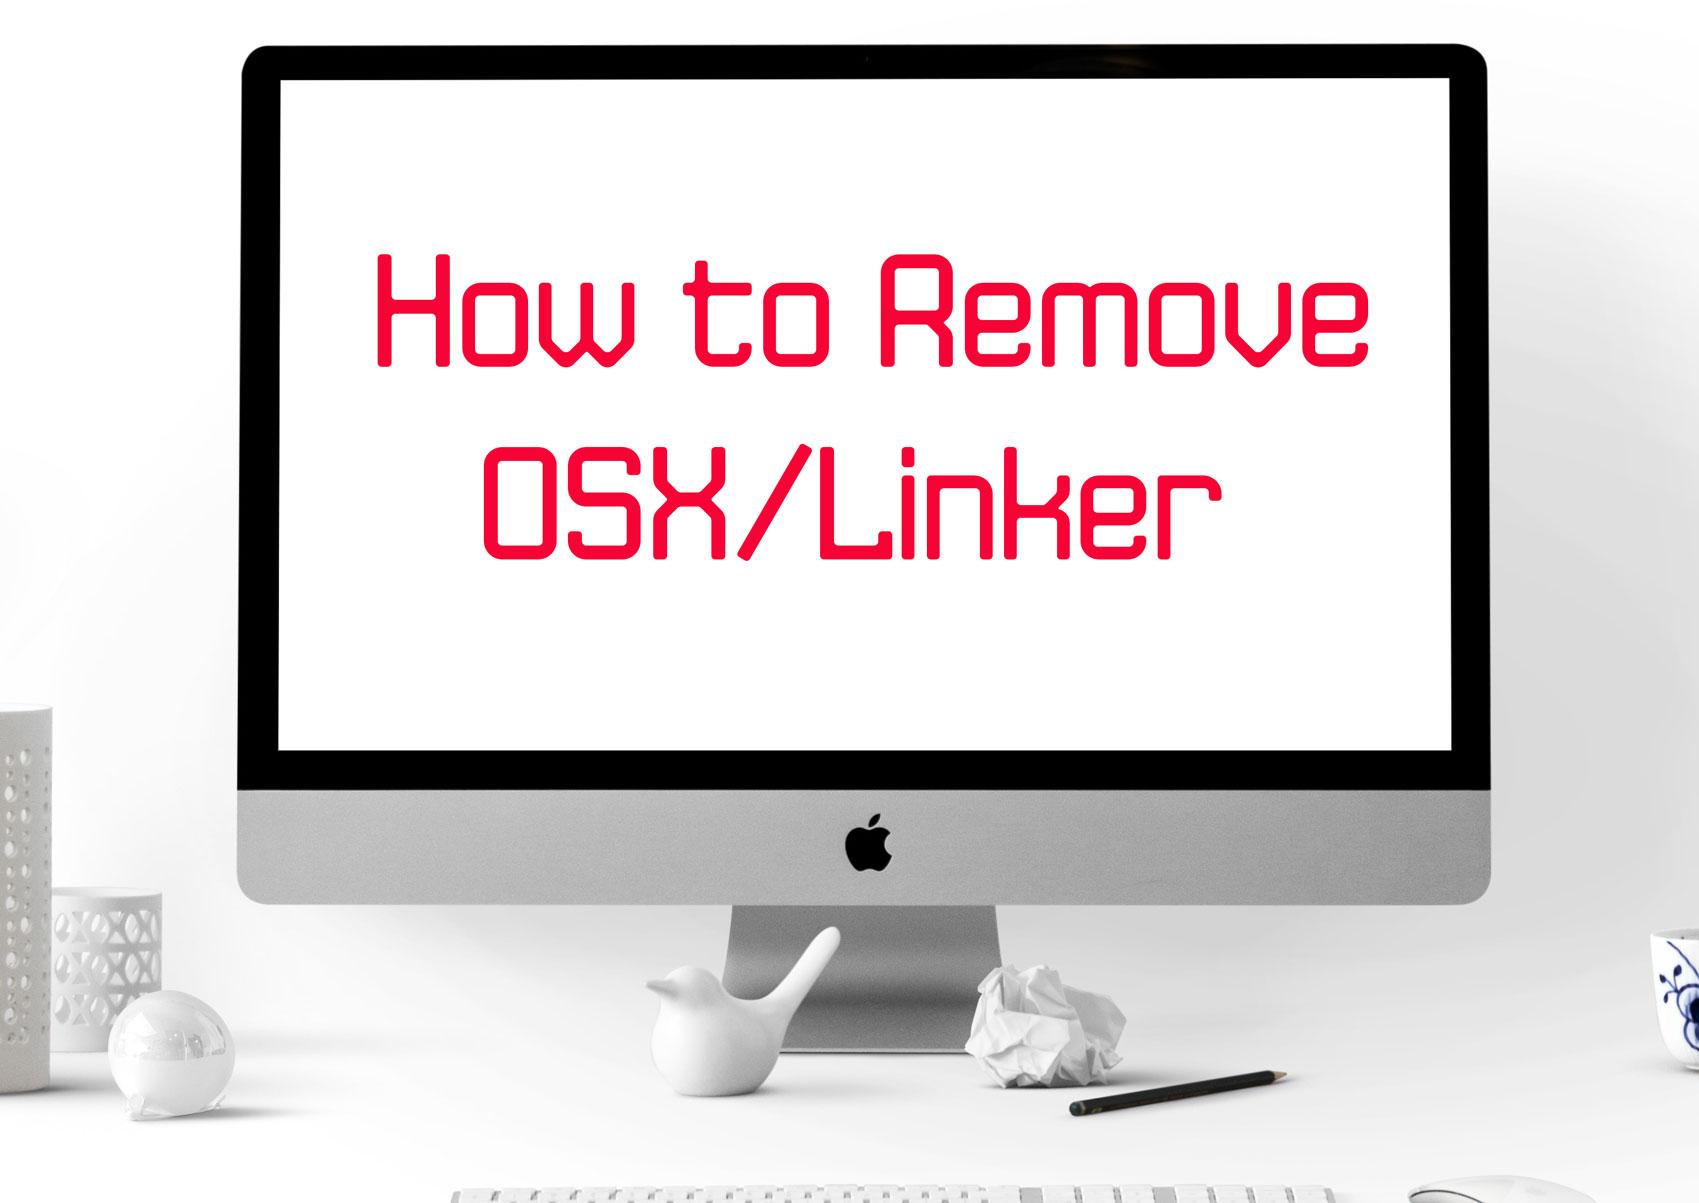 OSX/Linker Virus on Mac (Malware) – How to Remove It